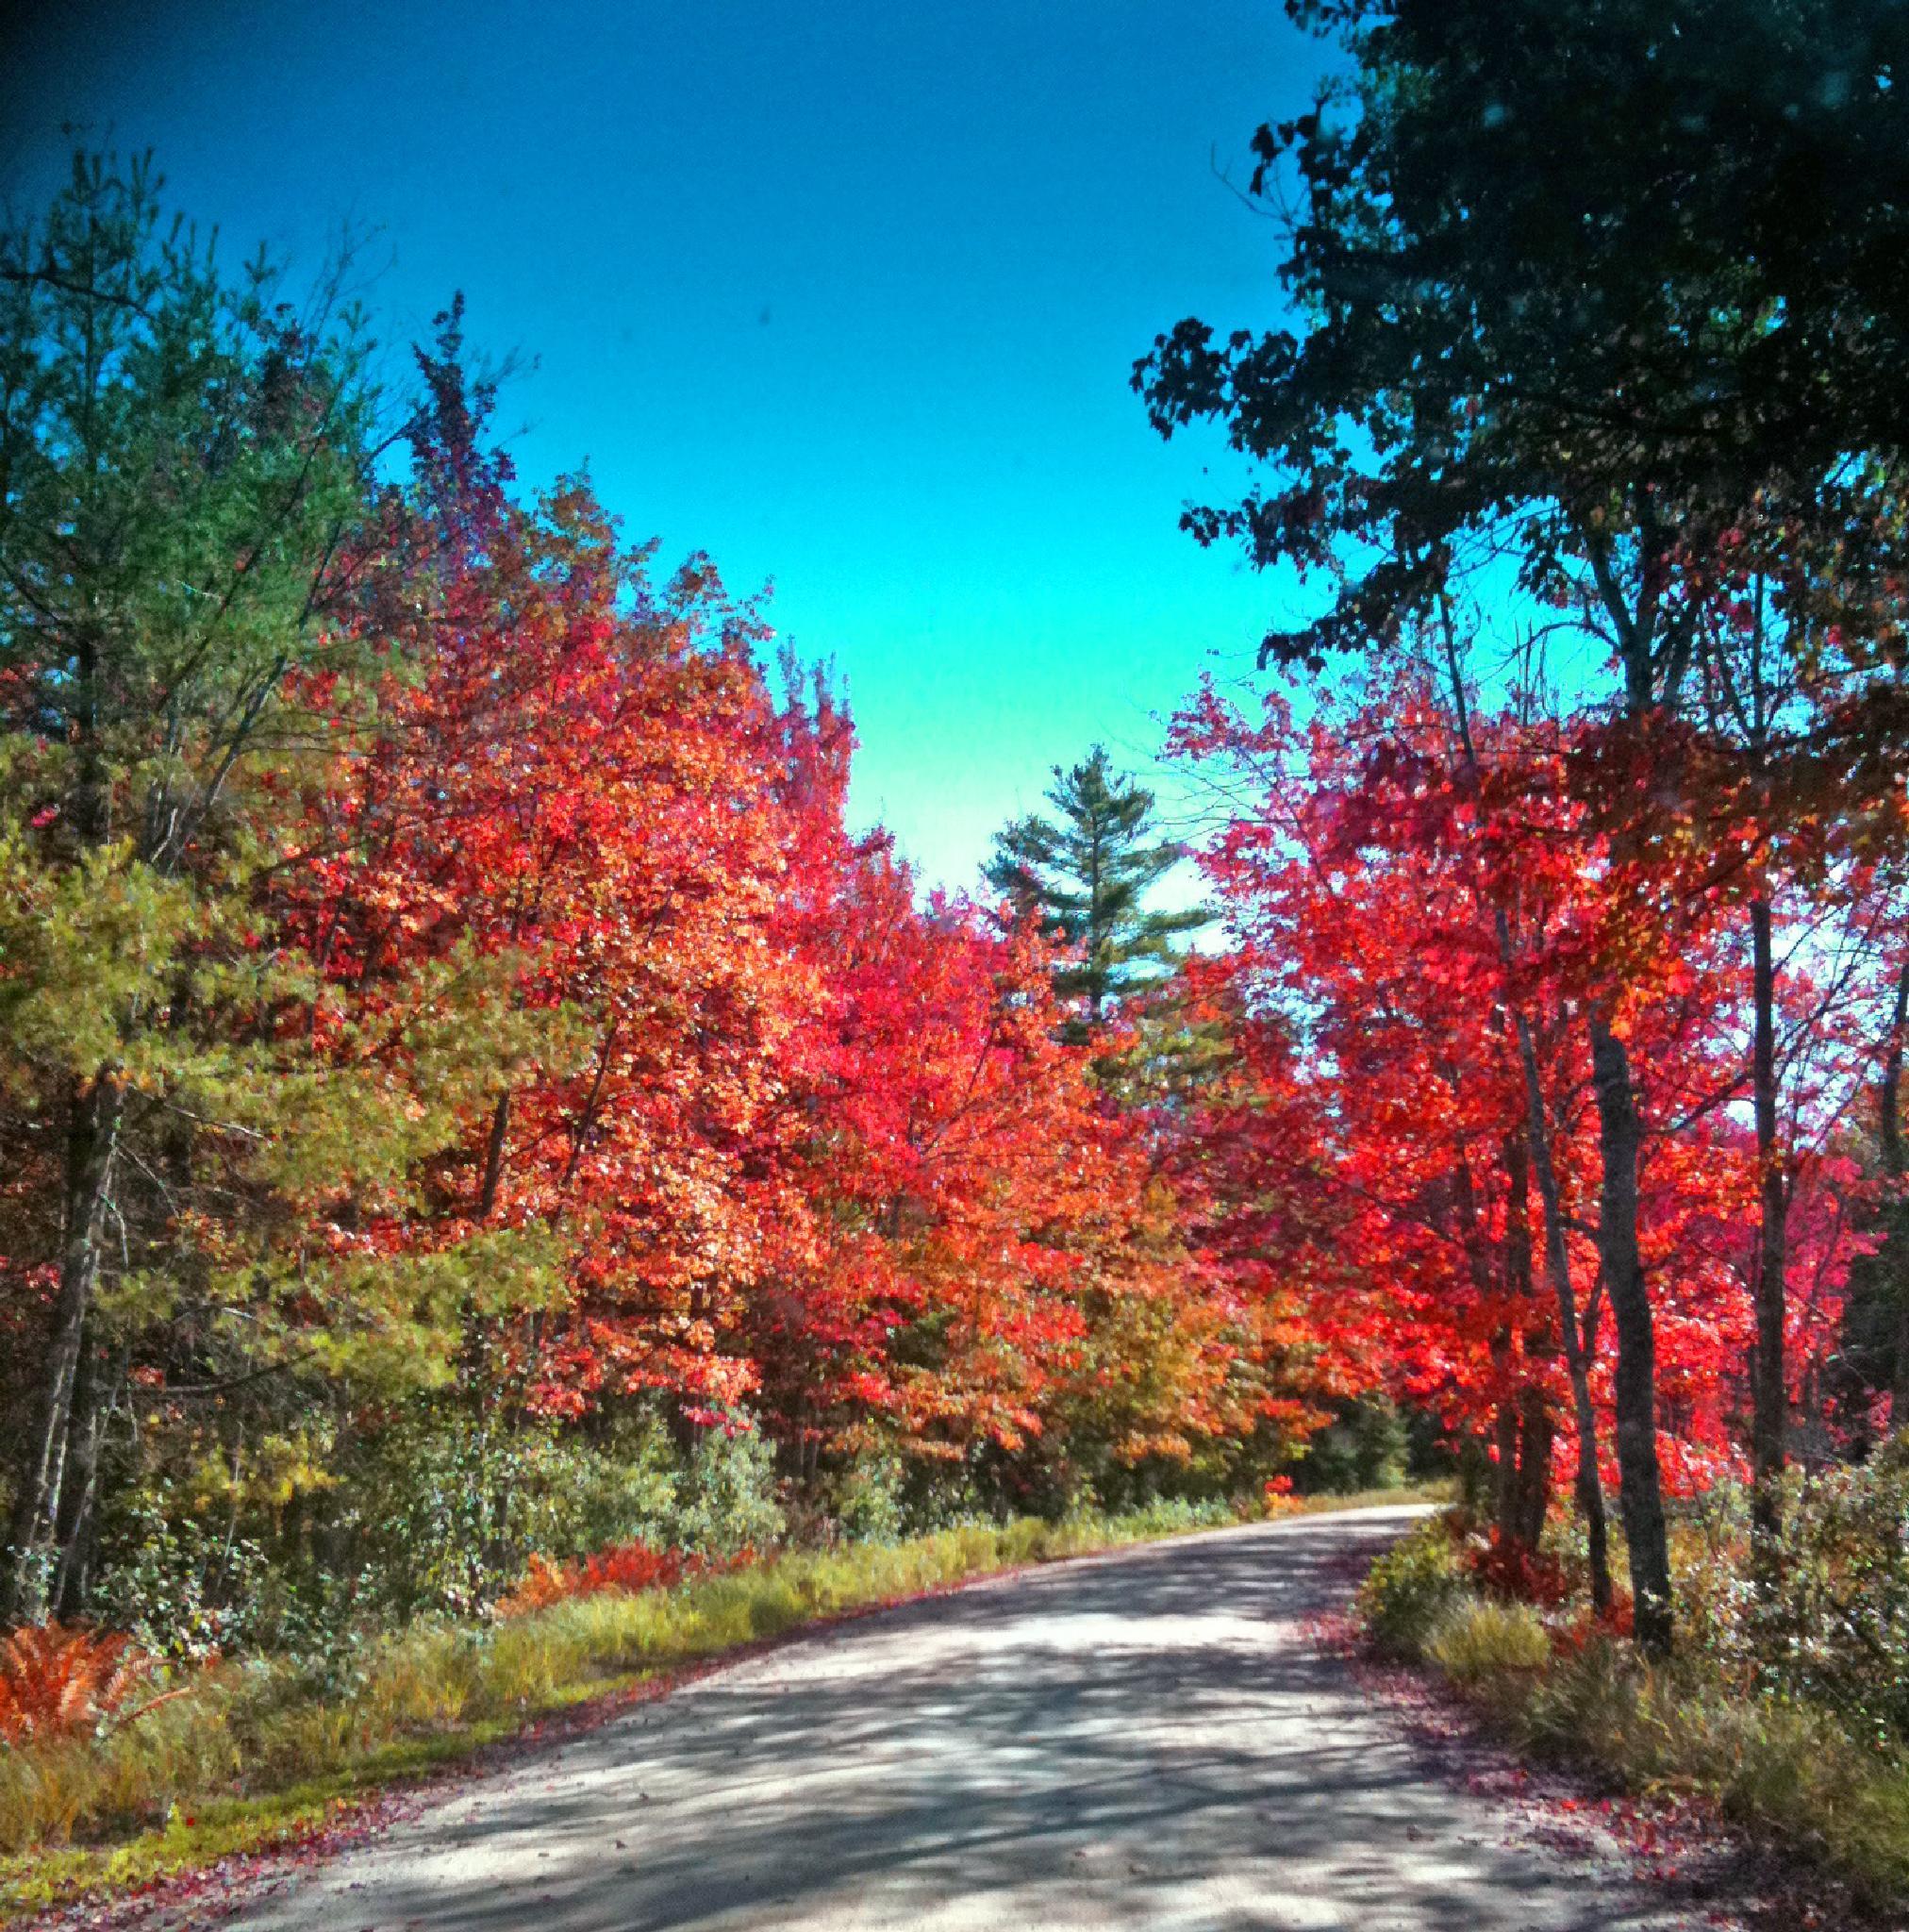 Road home by SassieKatt